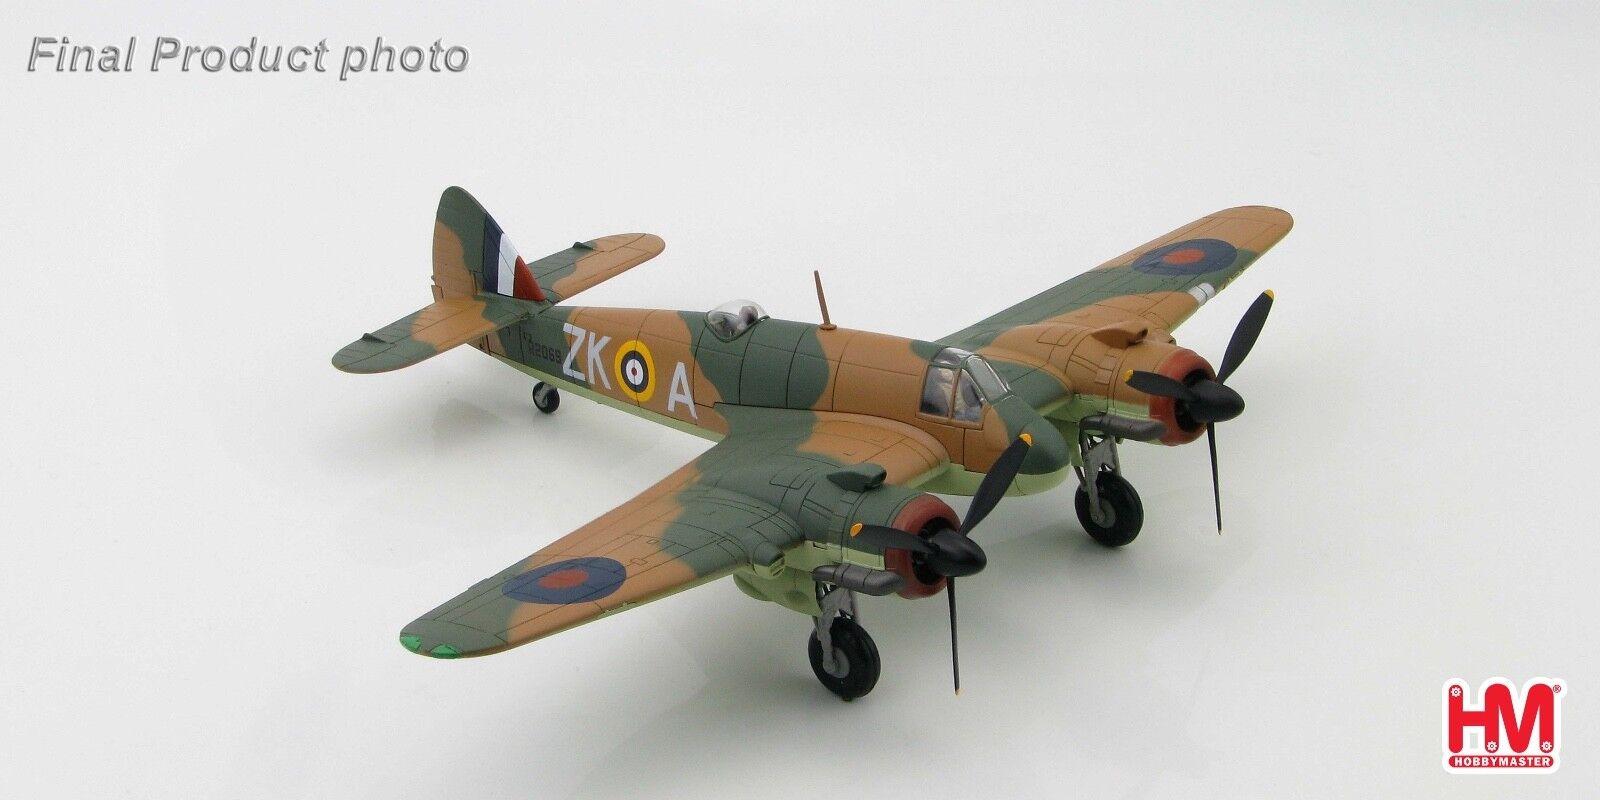 Hobby Master HA2313 1 72 Bristol Beaufighter Mk. If R2069  zk-un  25 Sqn. Royal Air Force 1940